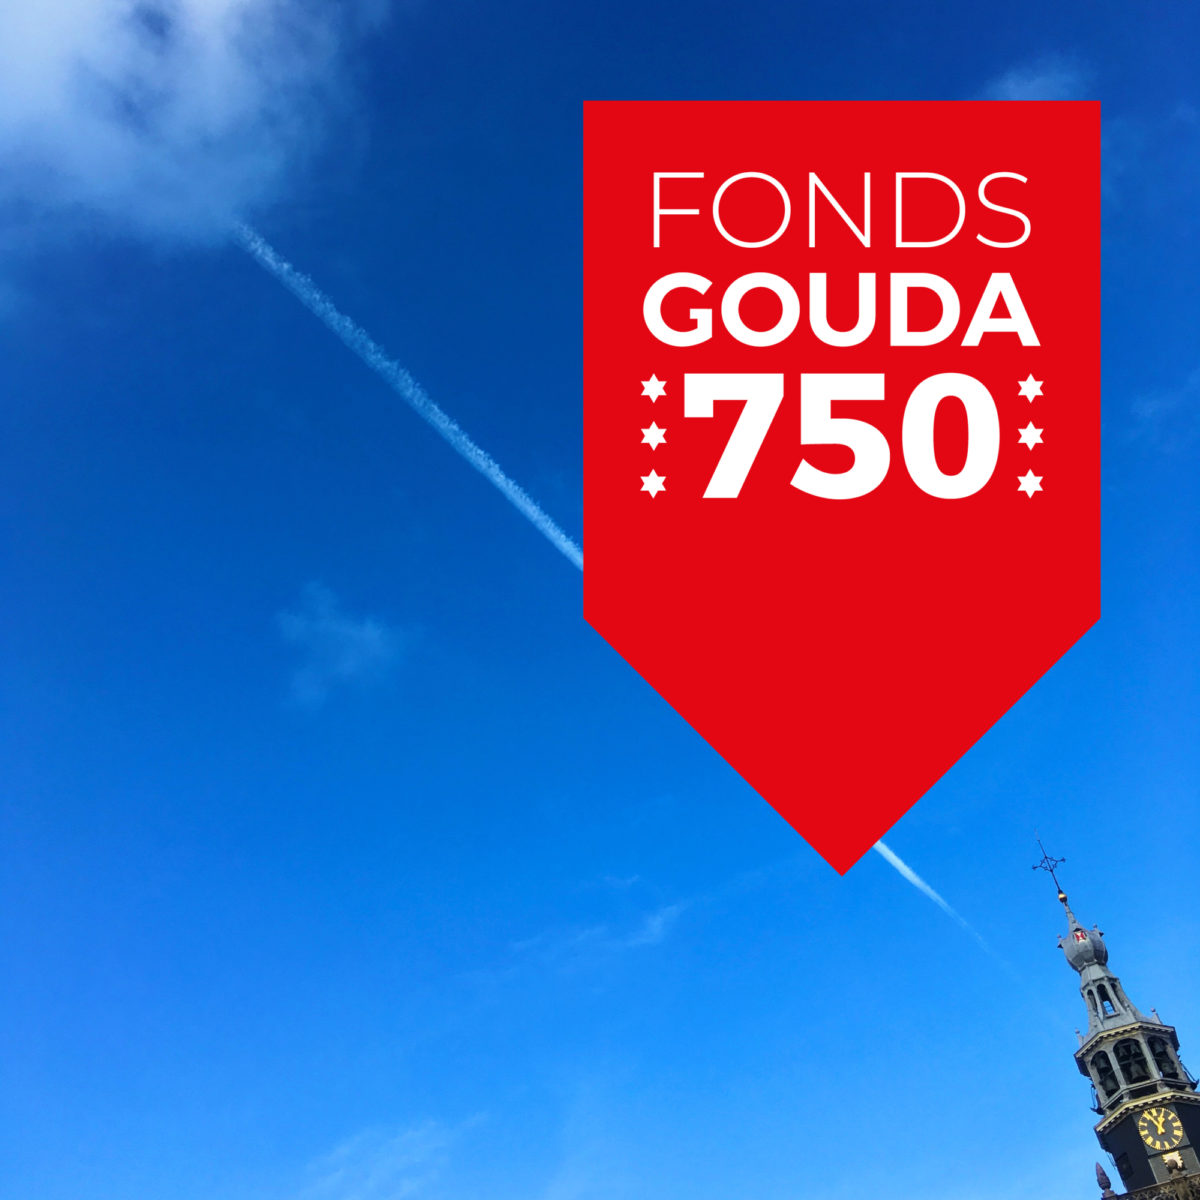 FONDSGOUDA750 Website beeld